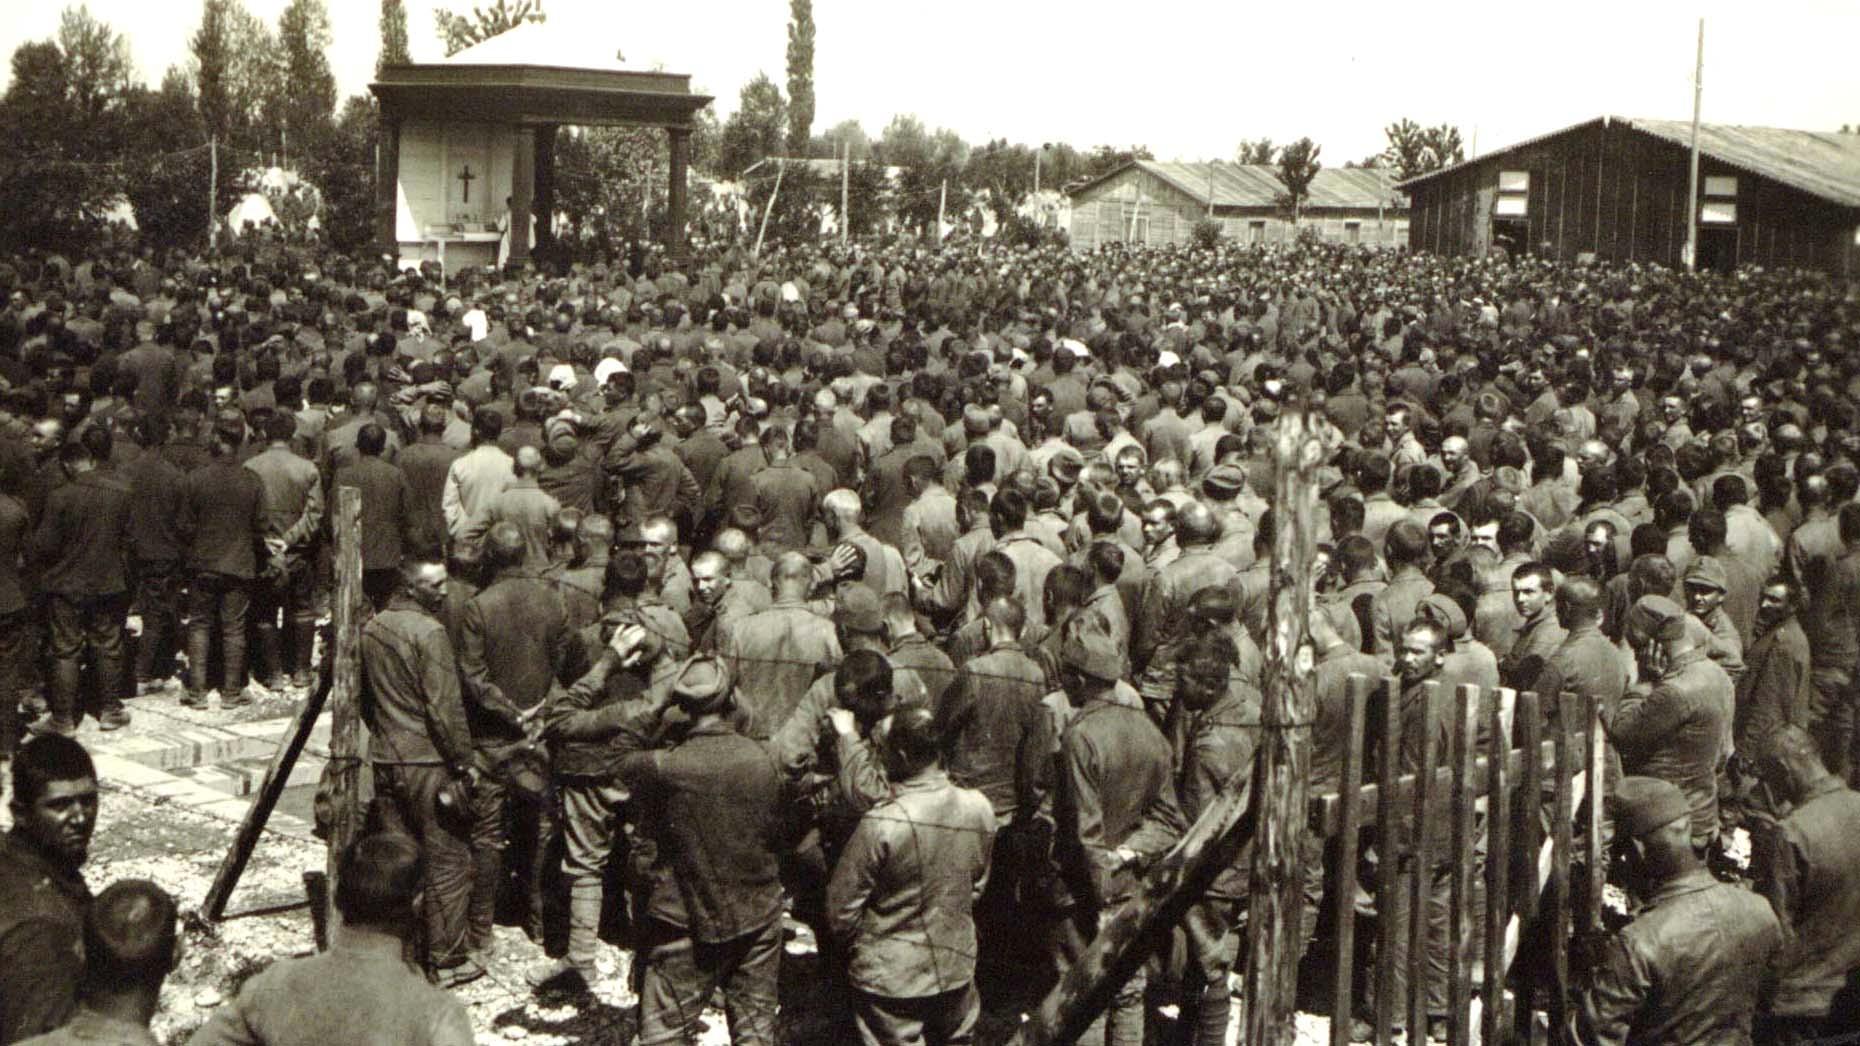 Concentration camp for prisoners (detail)